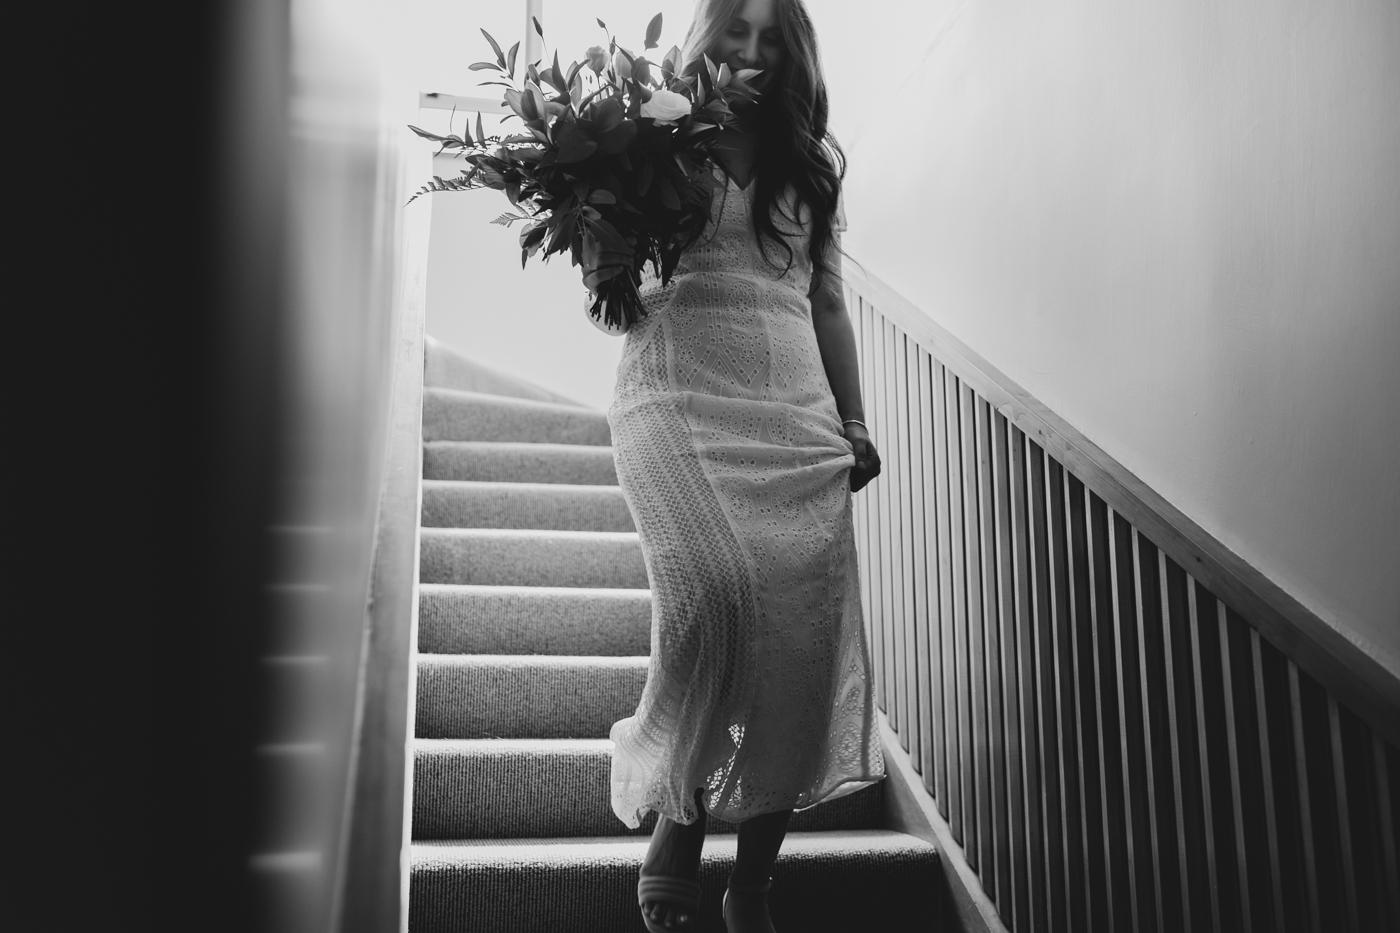 Ariana & Tim - Dunedin, New Zealand Wedding - Destination Wedding - Samantha Heather Photography-49.jpg